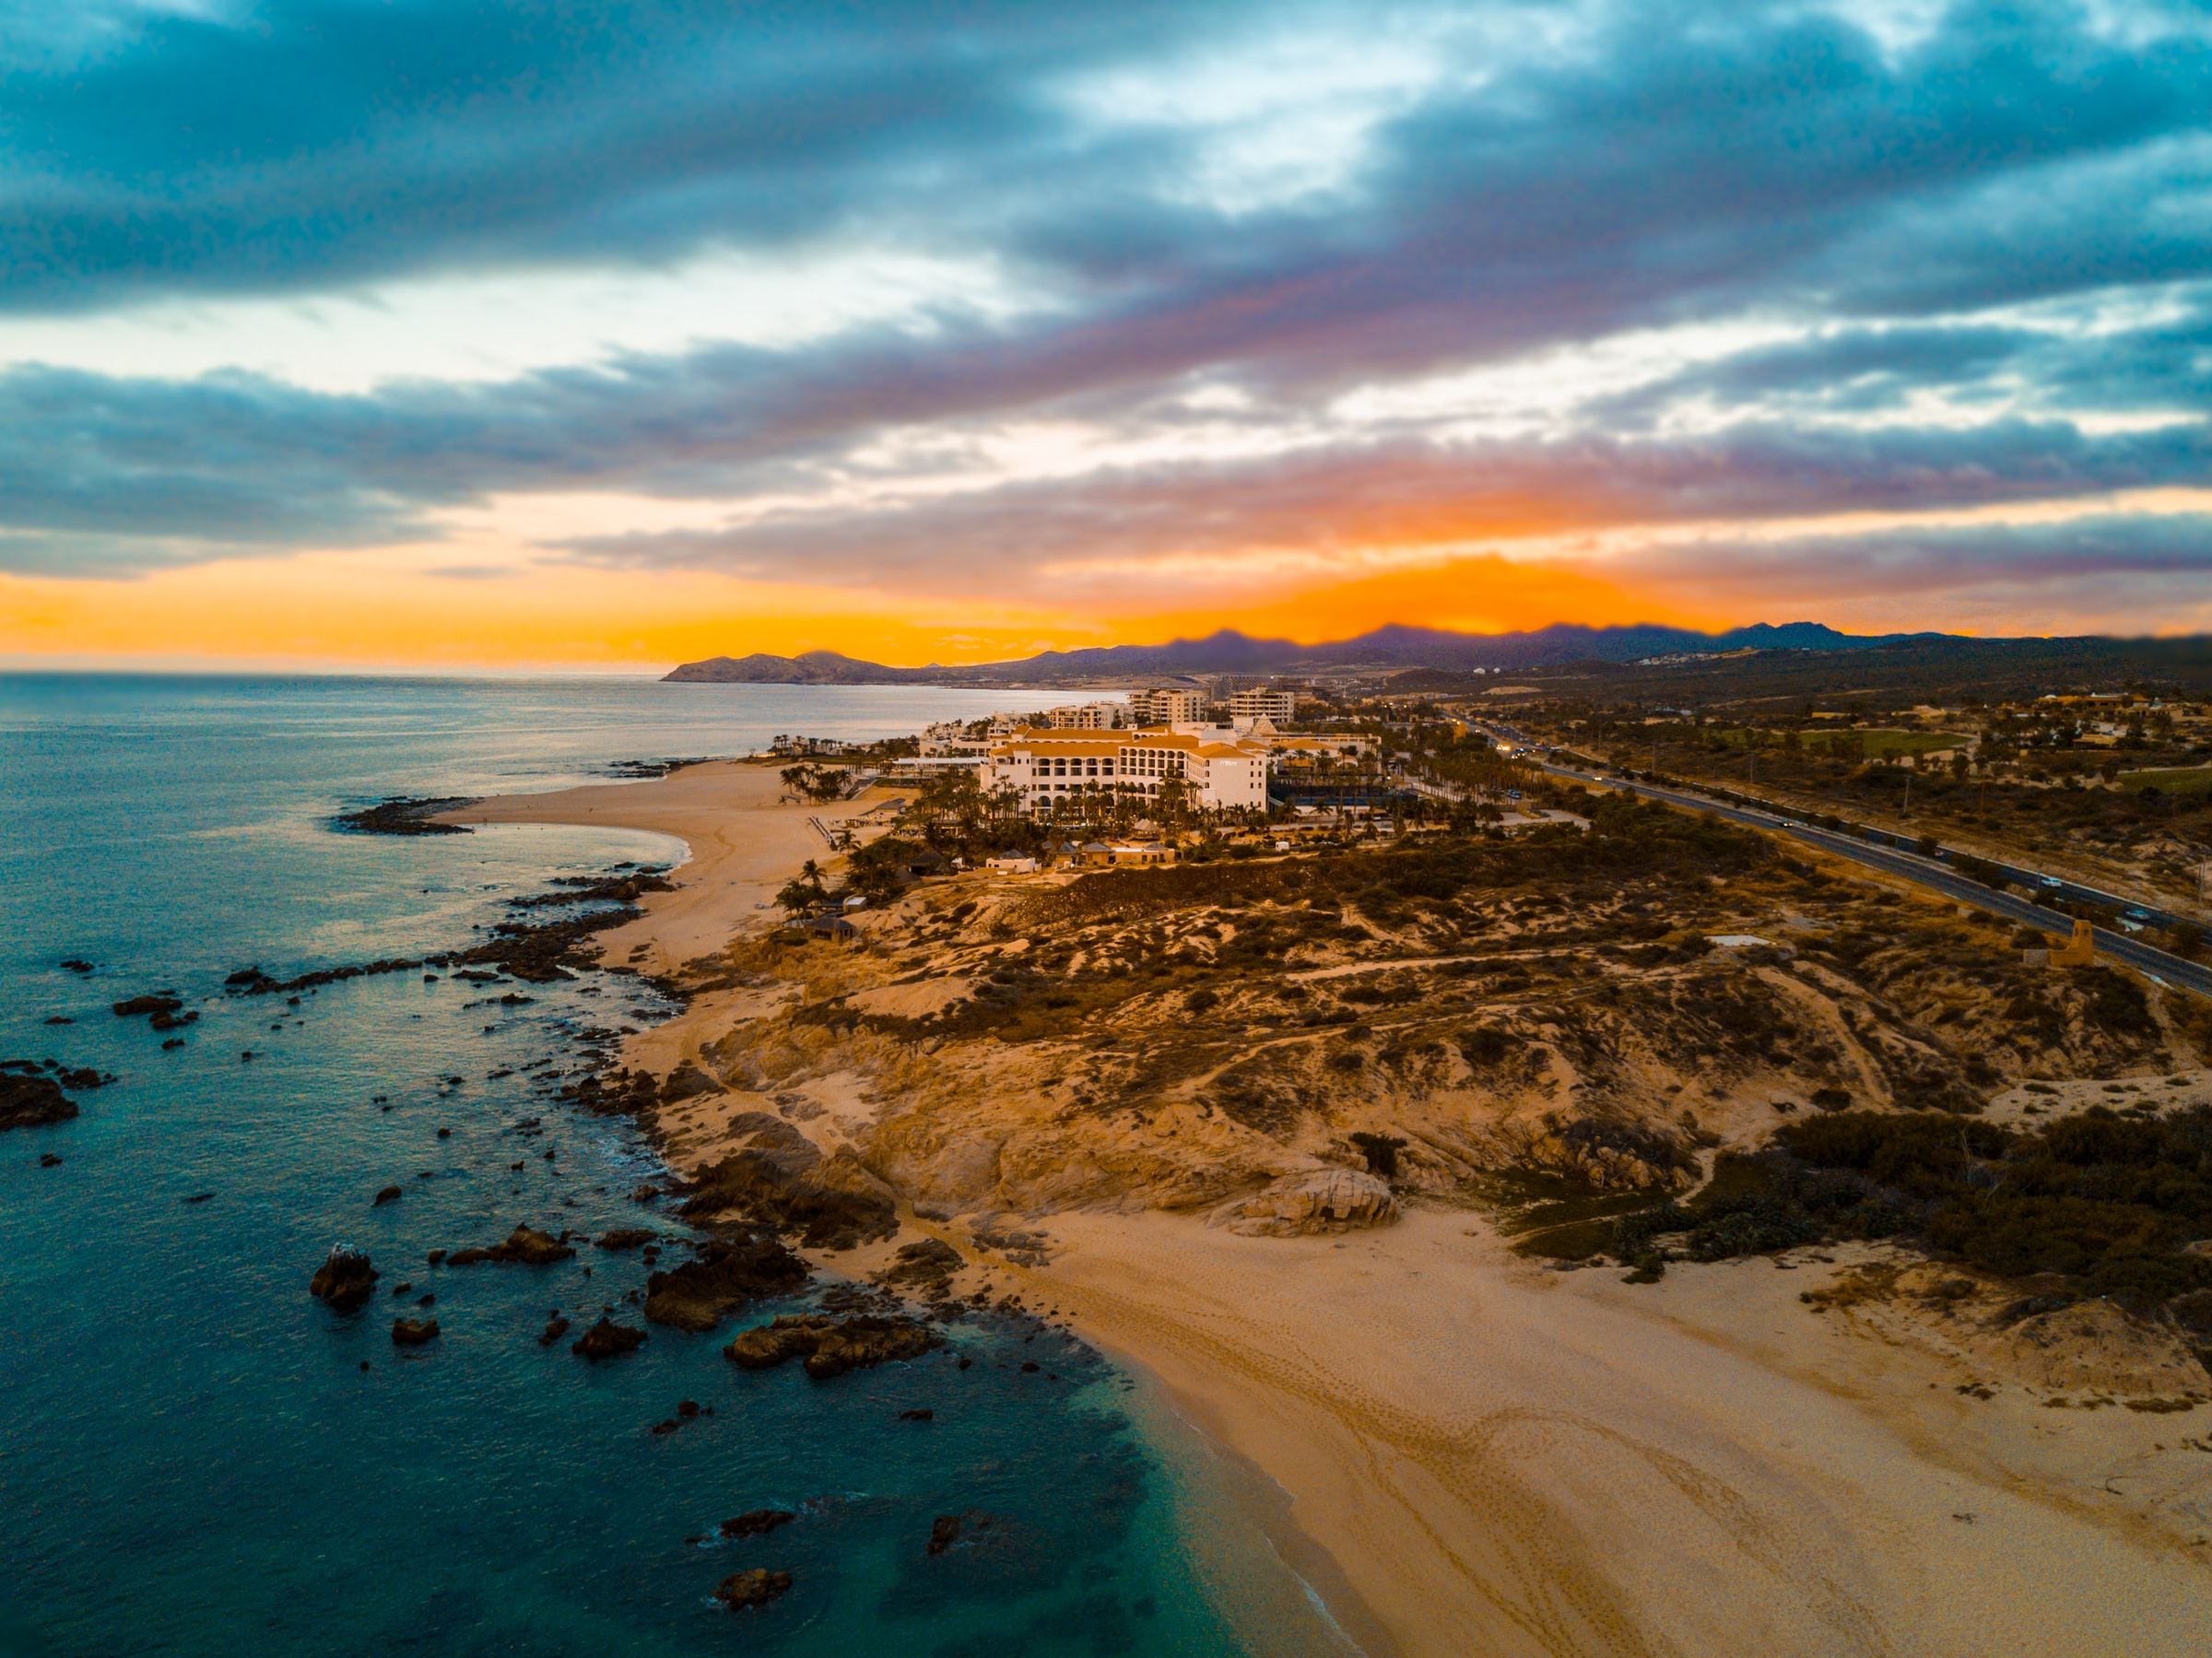 bird's eye view photography of house near seashore